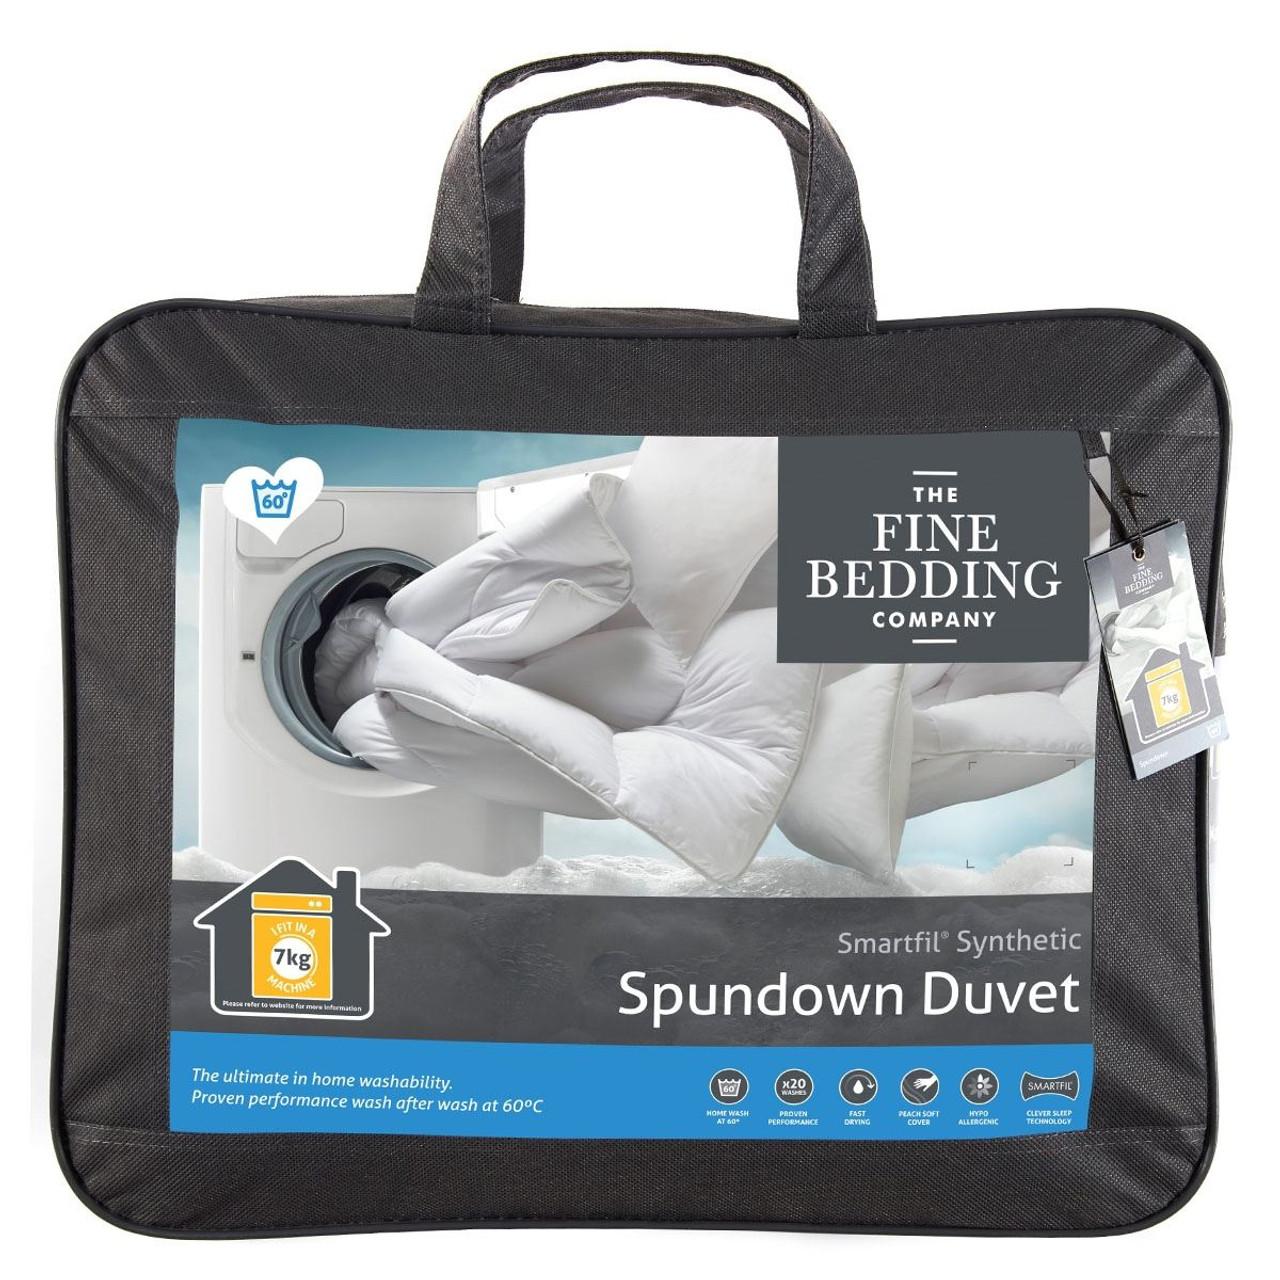 The Fine Bedding Company Spundown Duvet